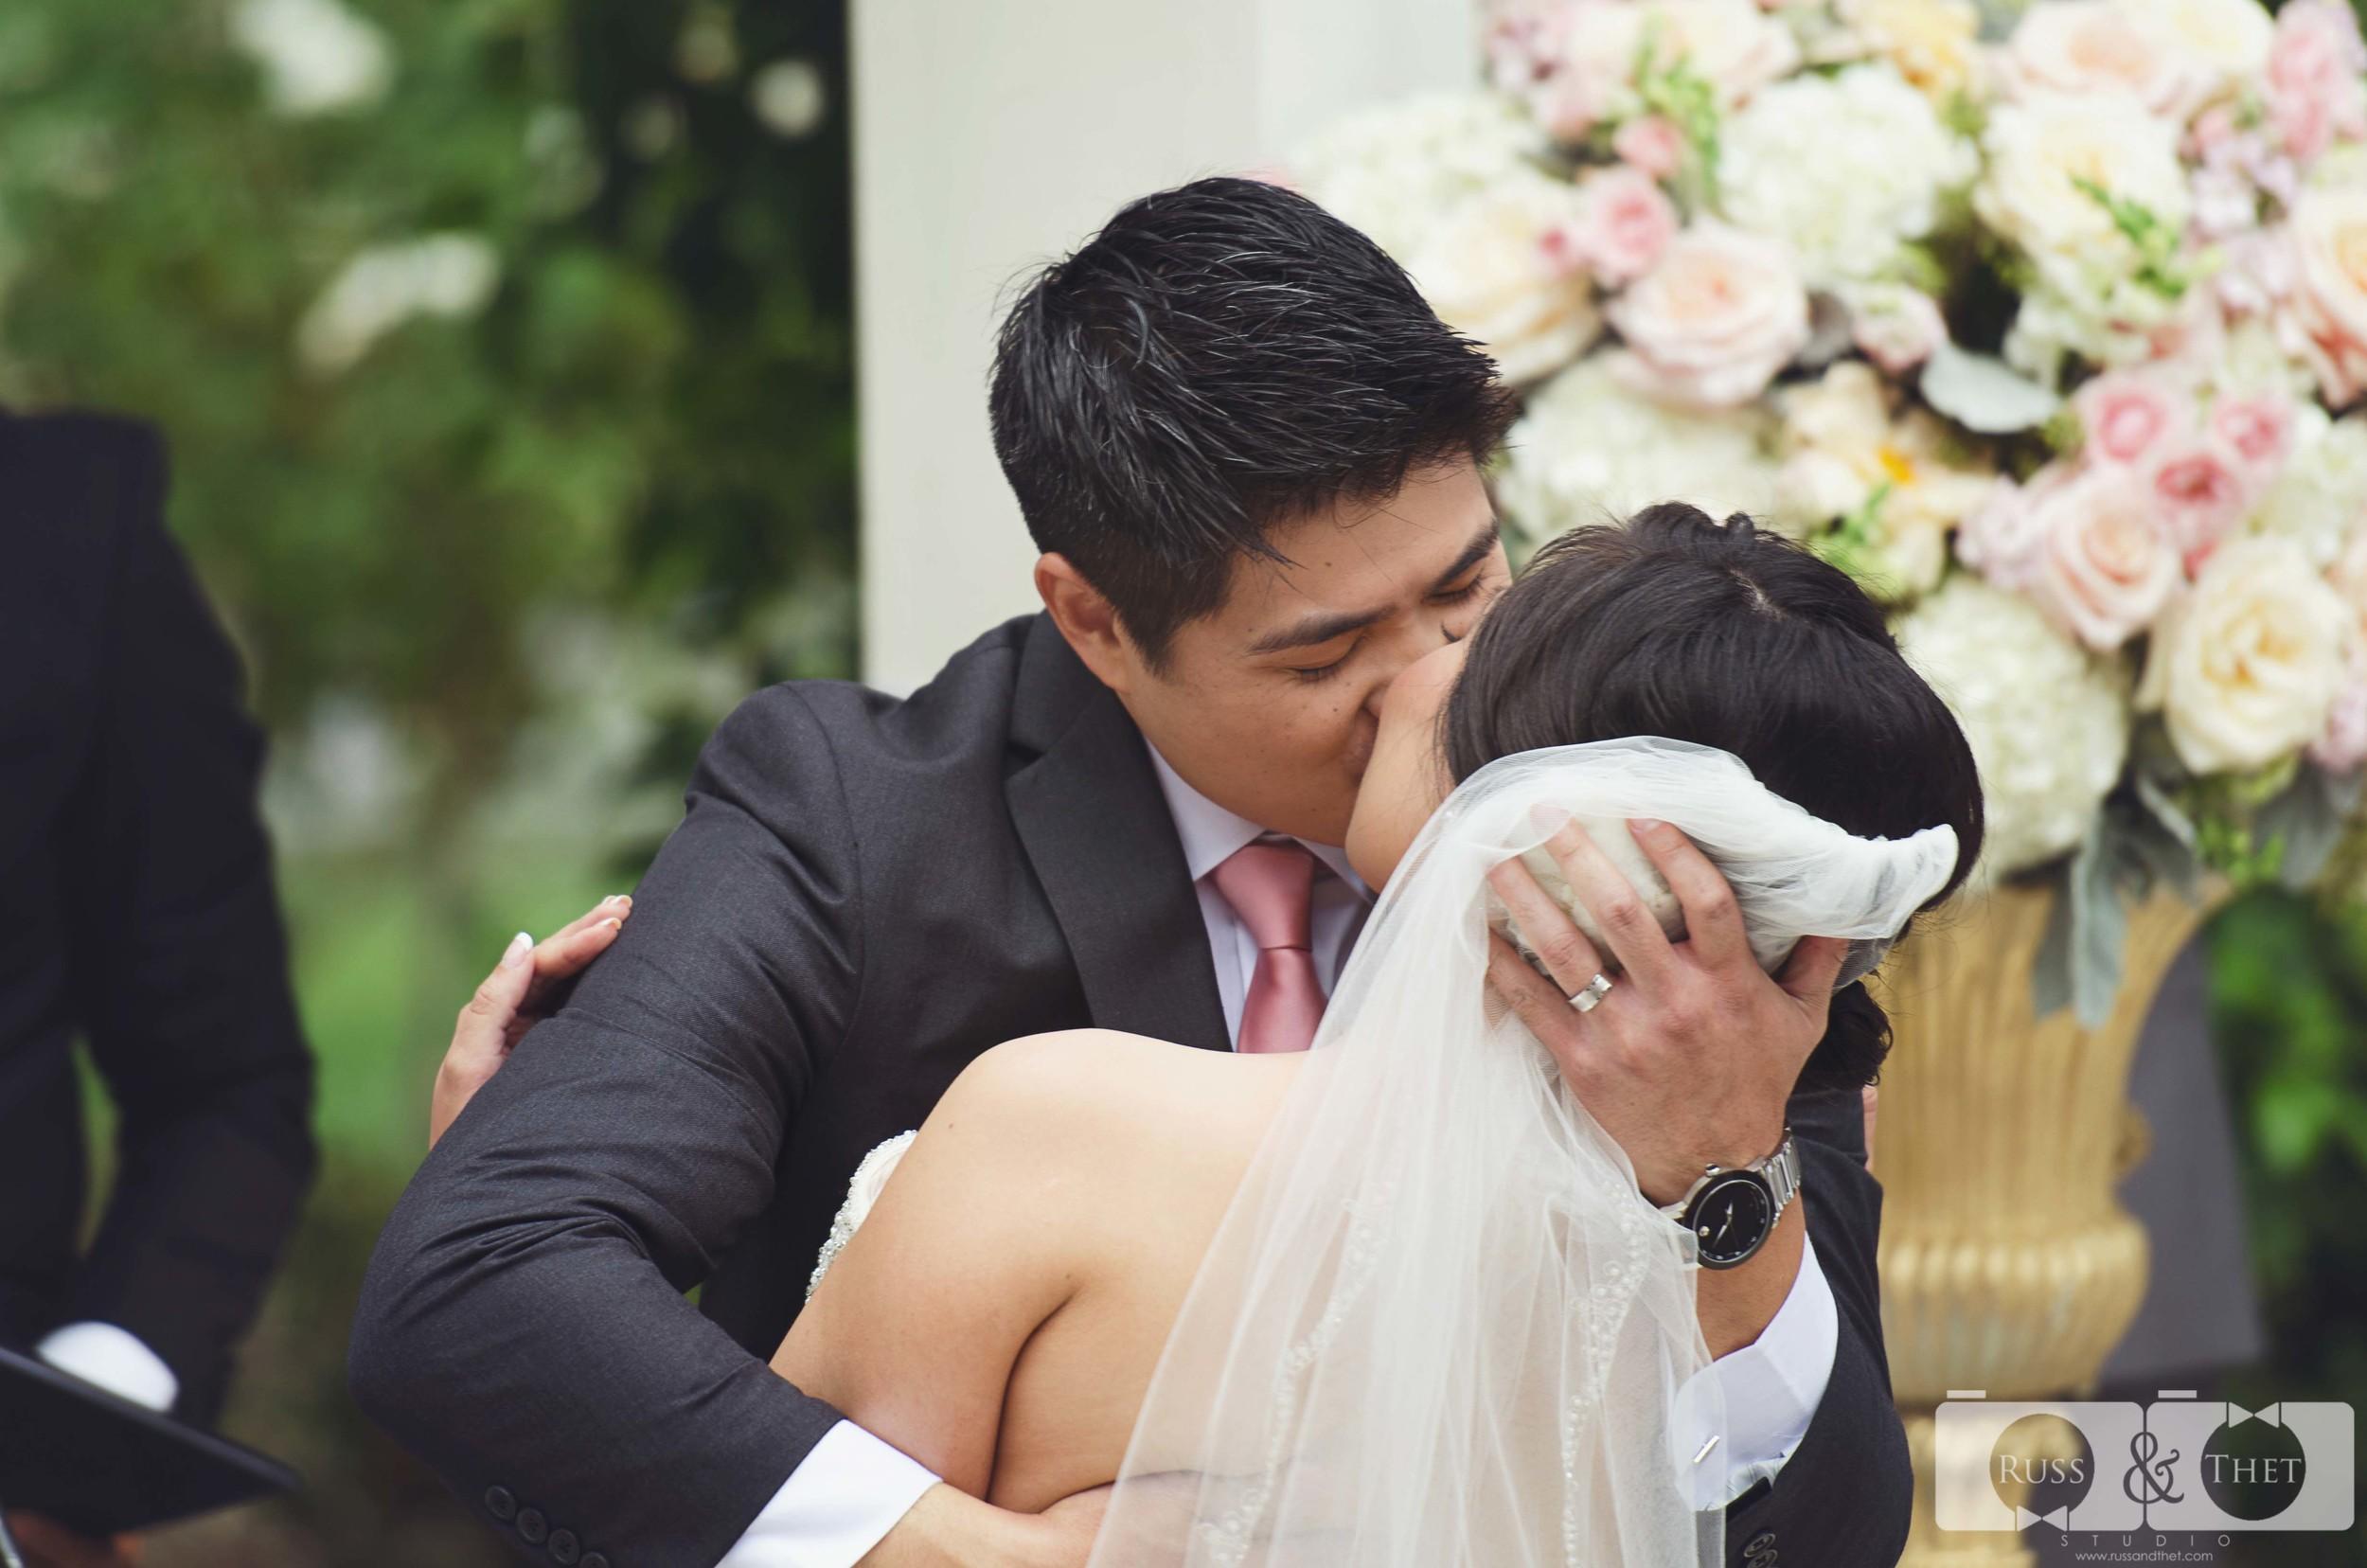 summit-house-fullerton-wedding-photographer-11.JPG